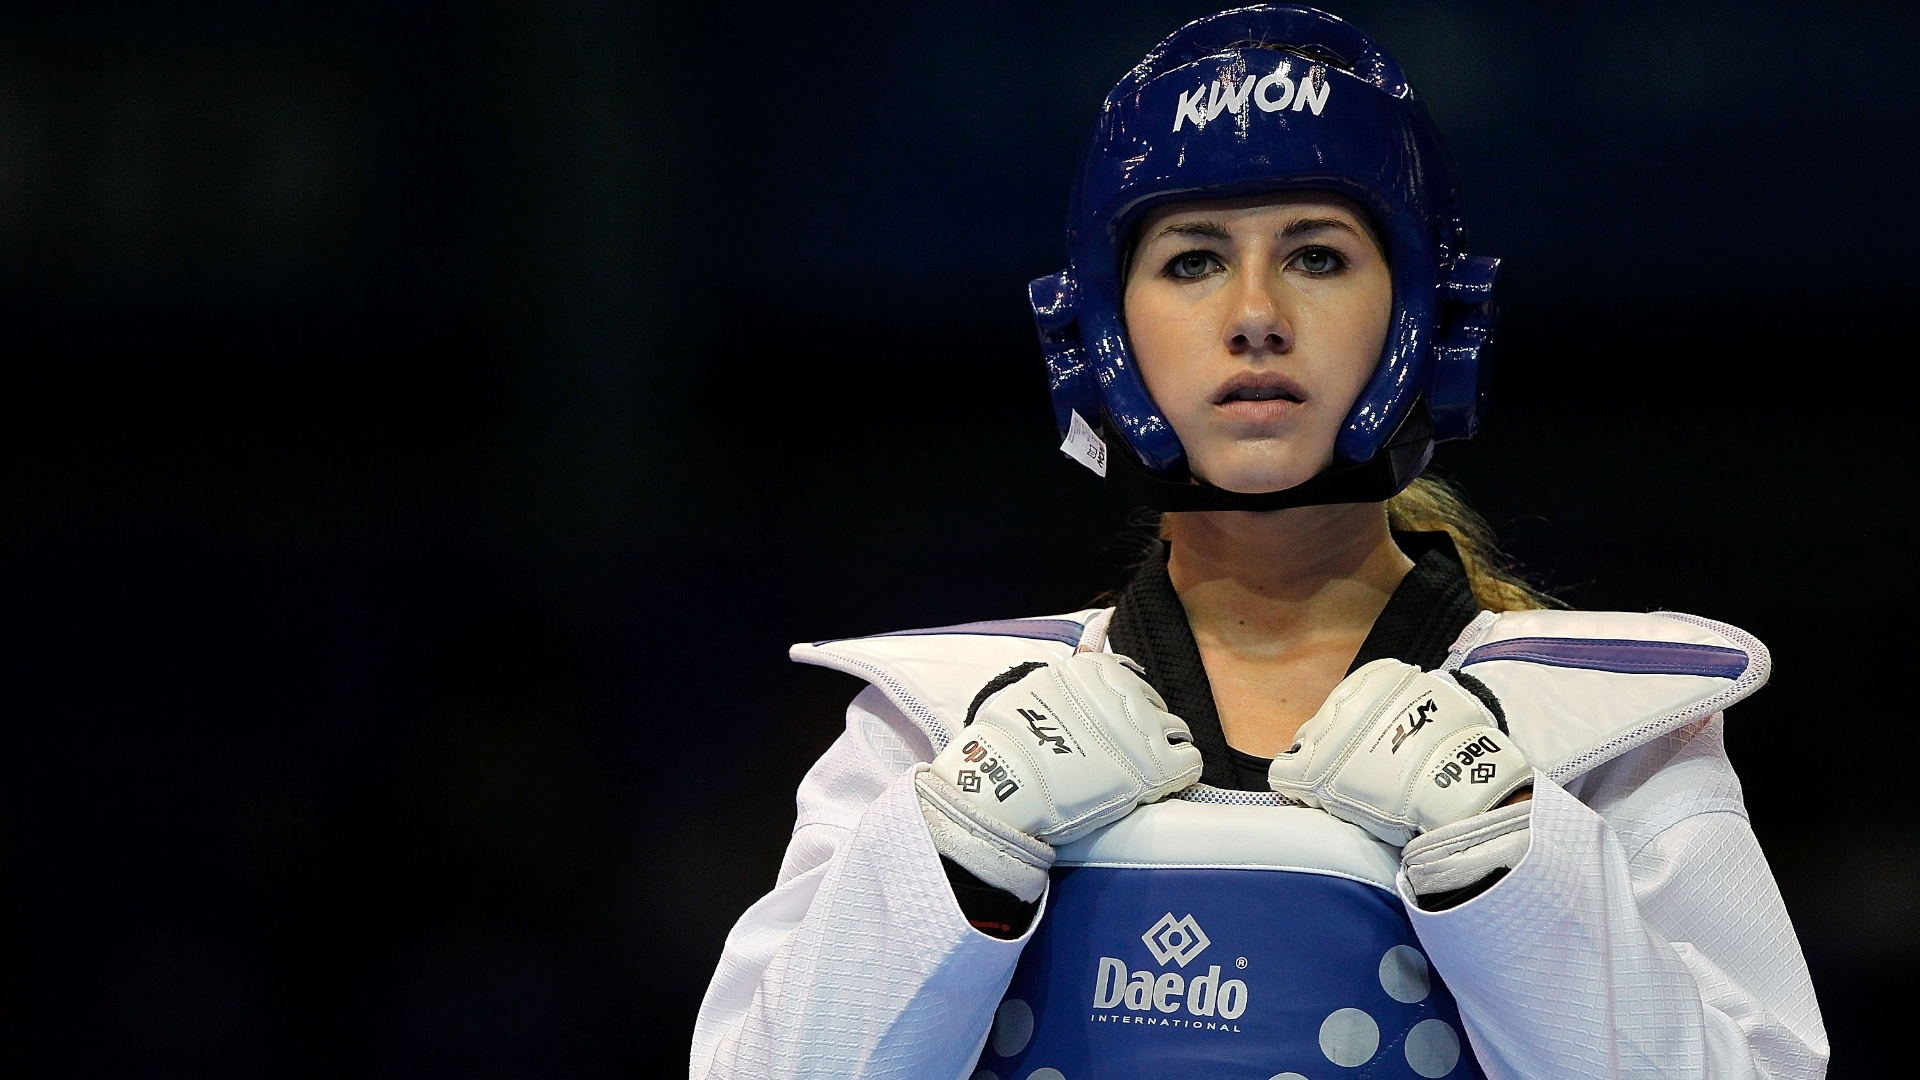 Norte-americana Nicole Palma compete no taekwondo no segundo dia do Pan de Guadalajara